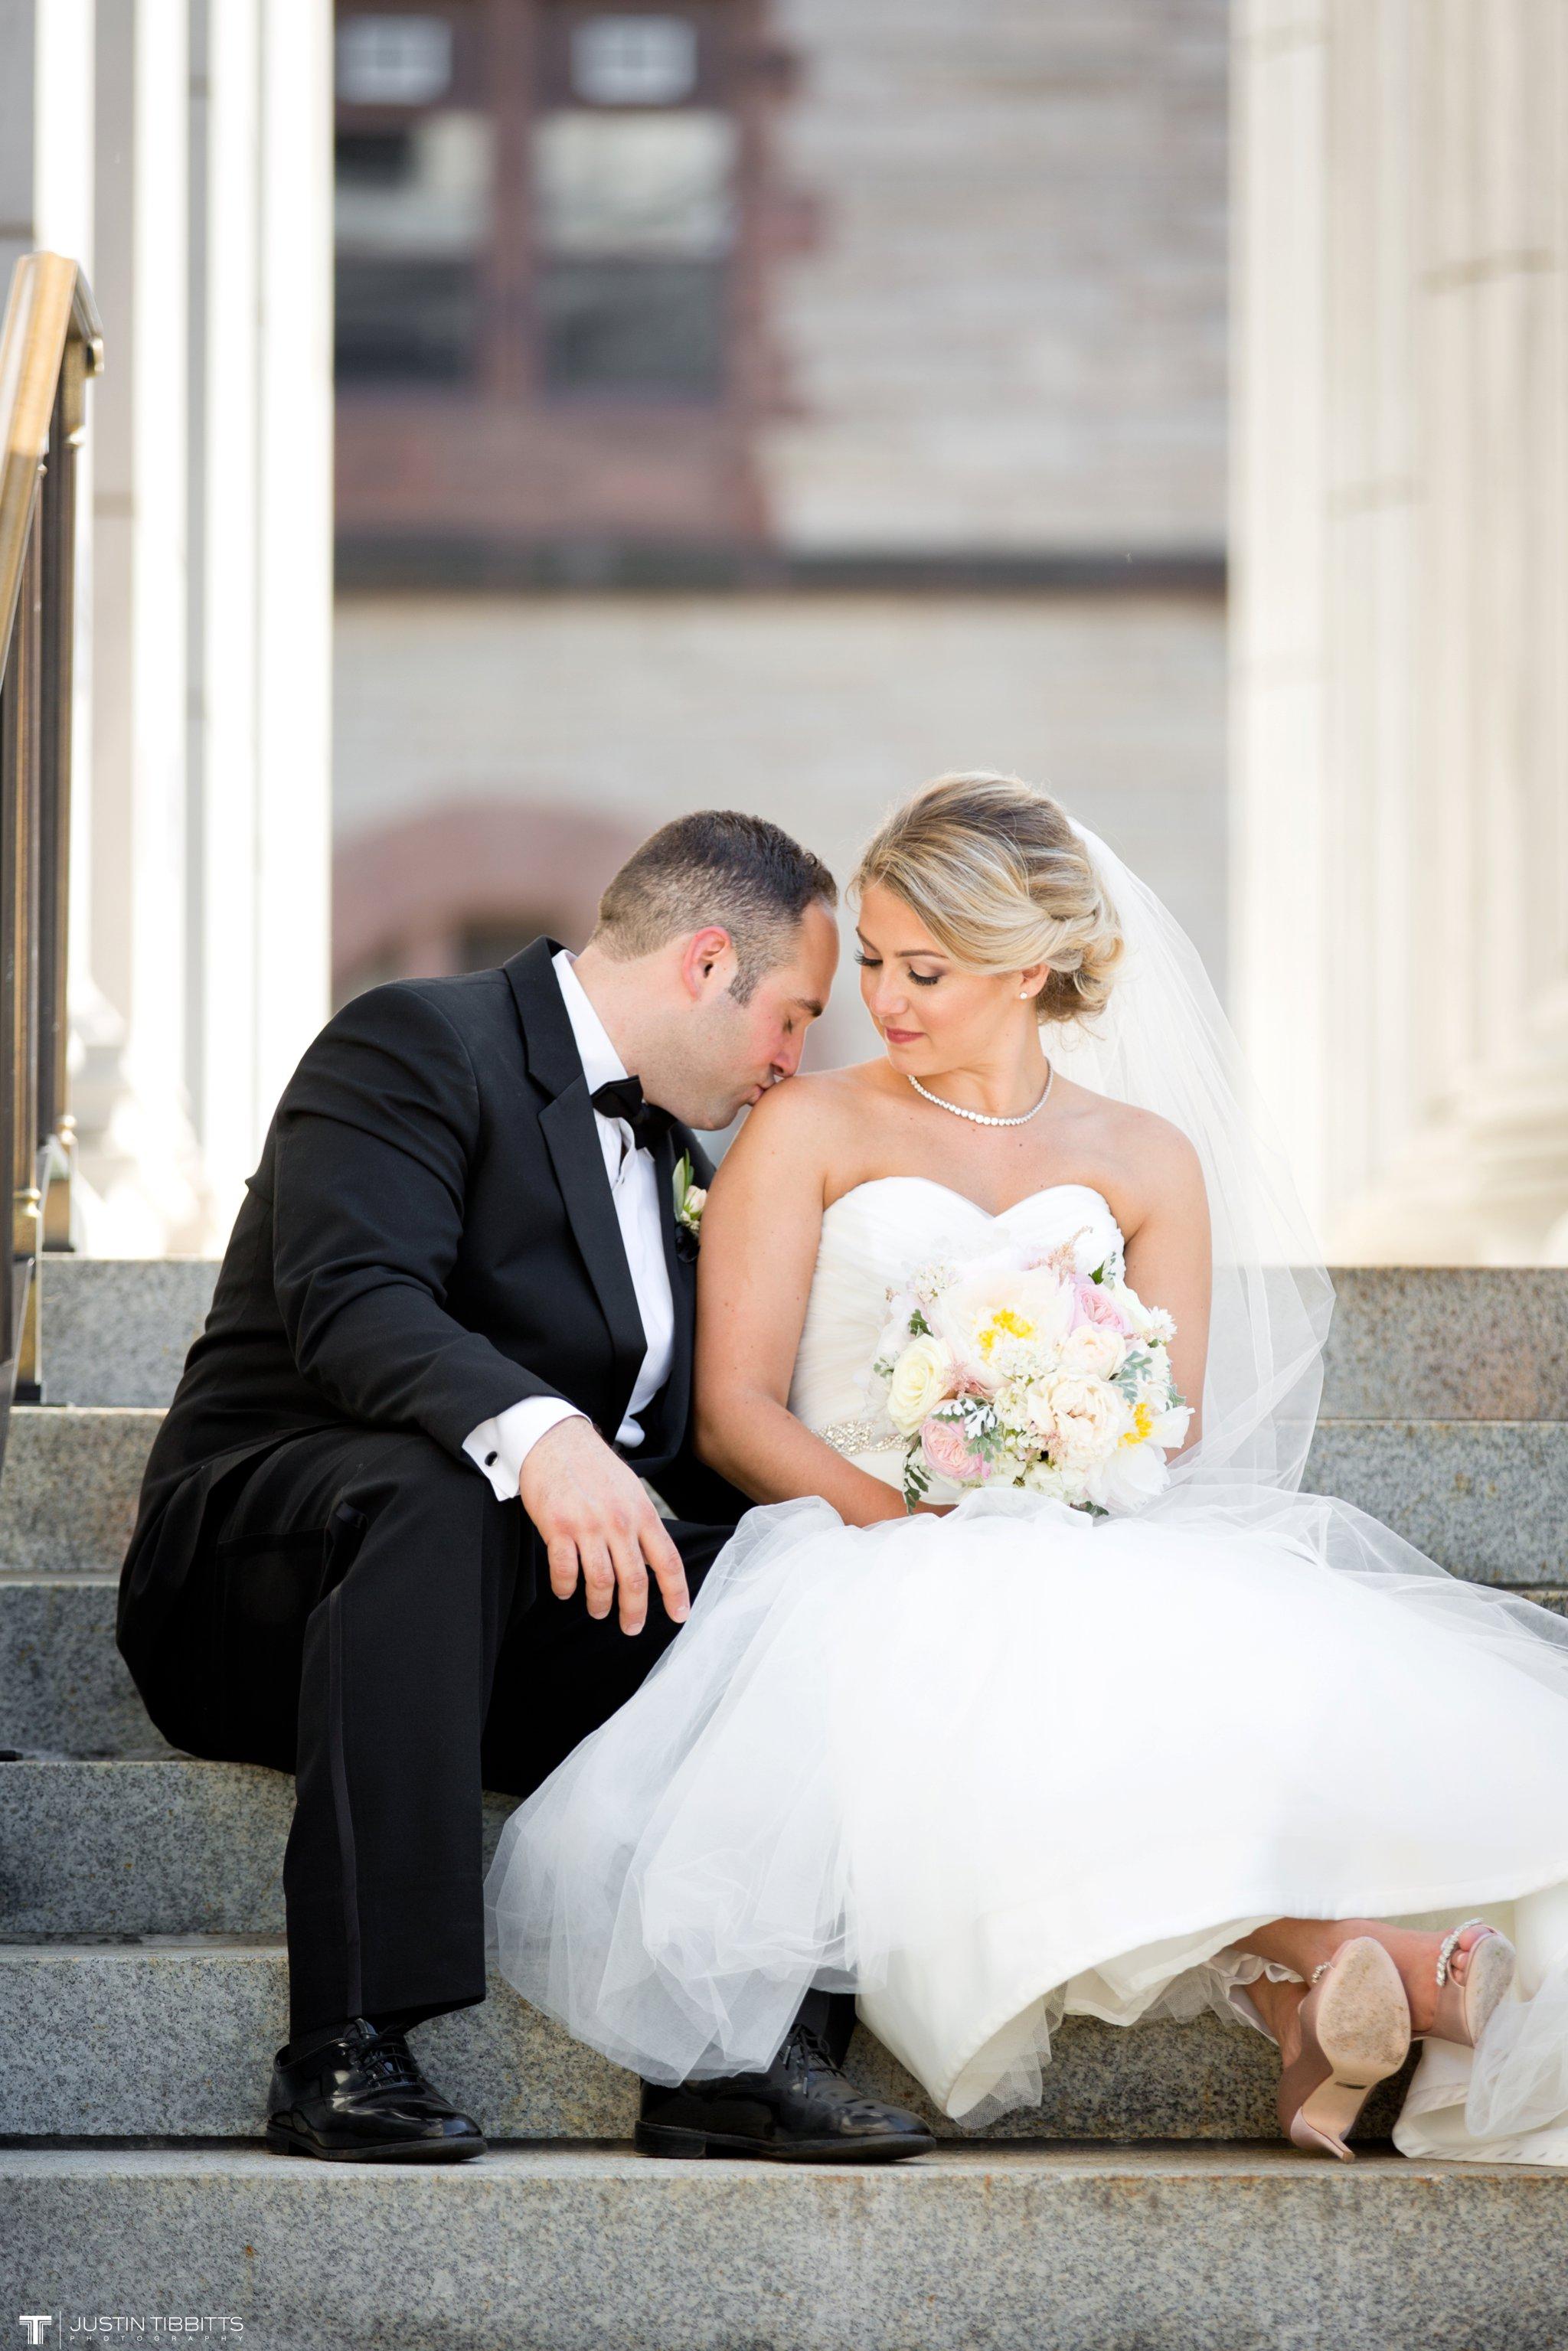 state-room-wedding-photos-with-amanda-and-nick_0119